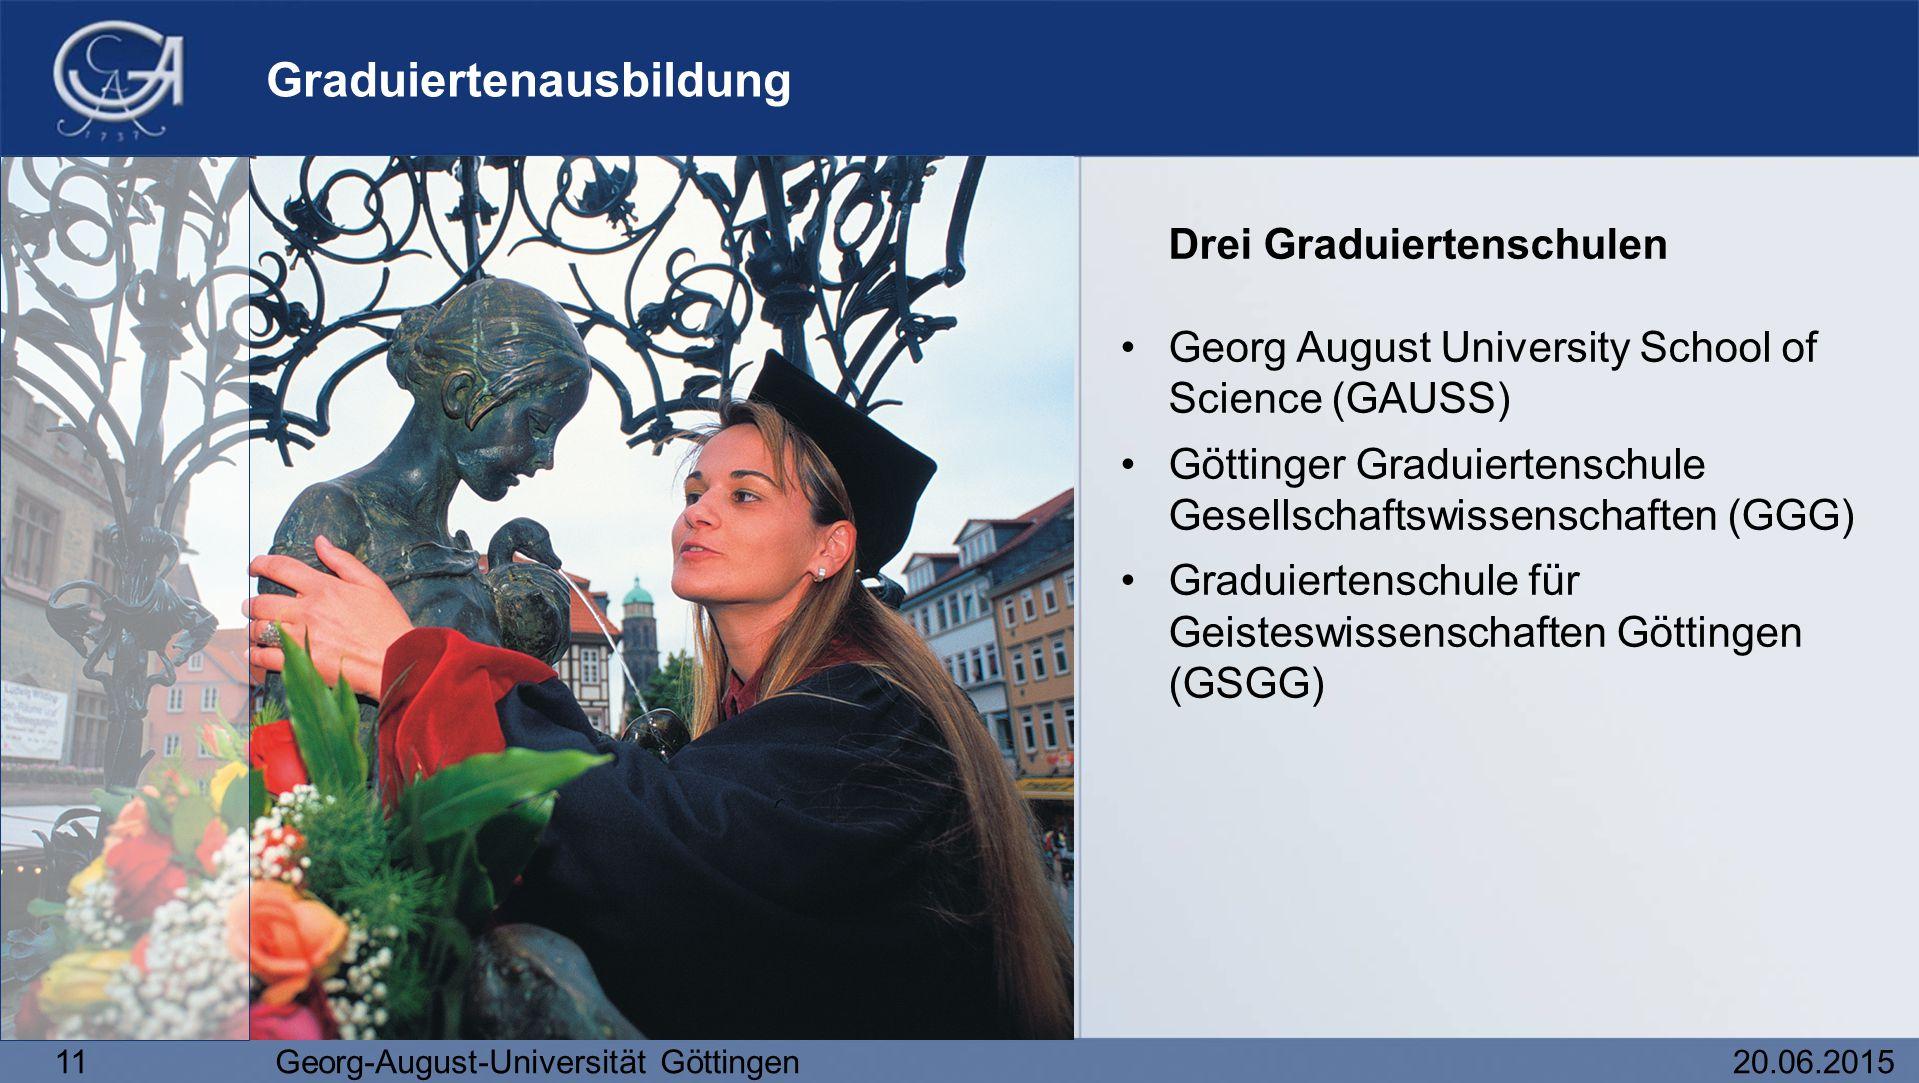 Graduiertenausbildung